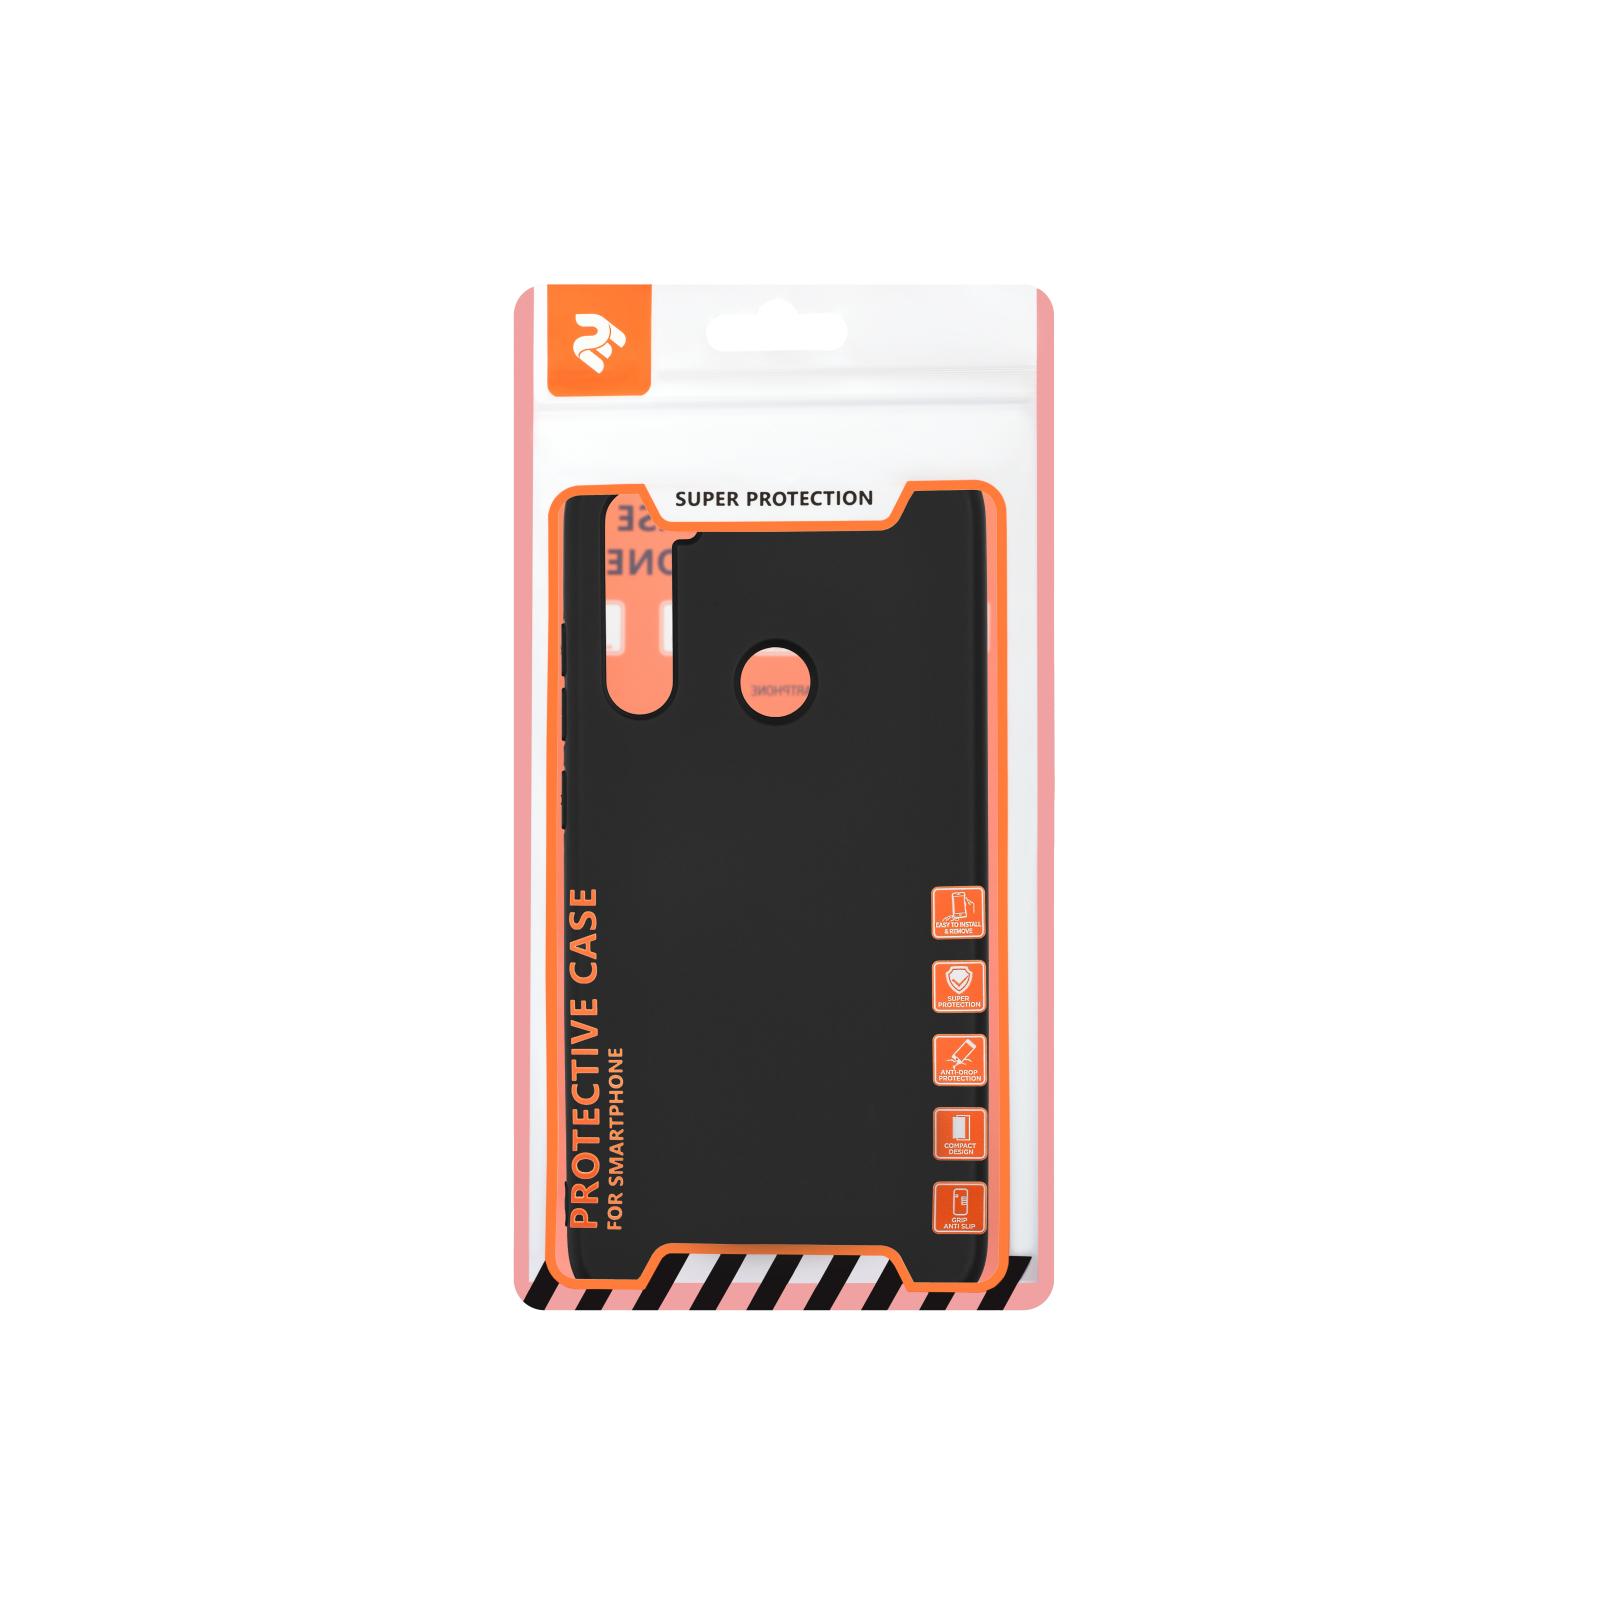 Чехол для моб. телефона 2E Xiaomi Redmi Note 8, Soft feeling, Black (2E-MI-N8-NKSF-BK) изображение 3